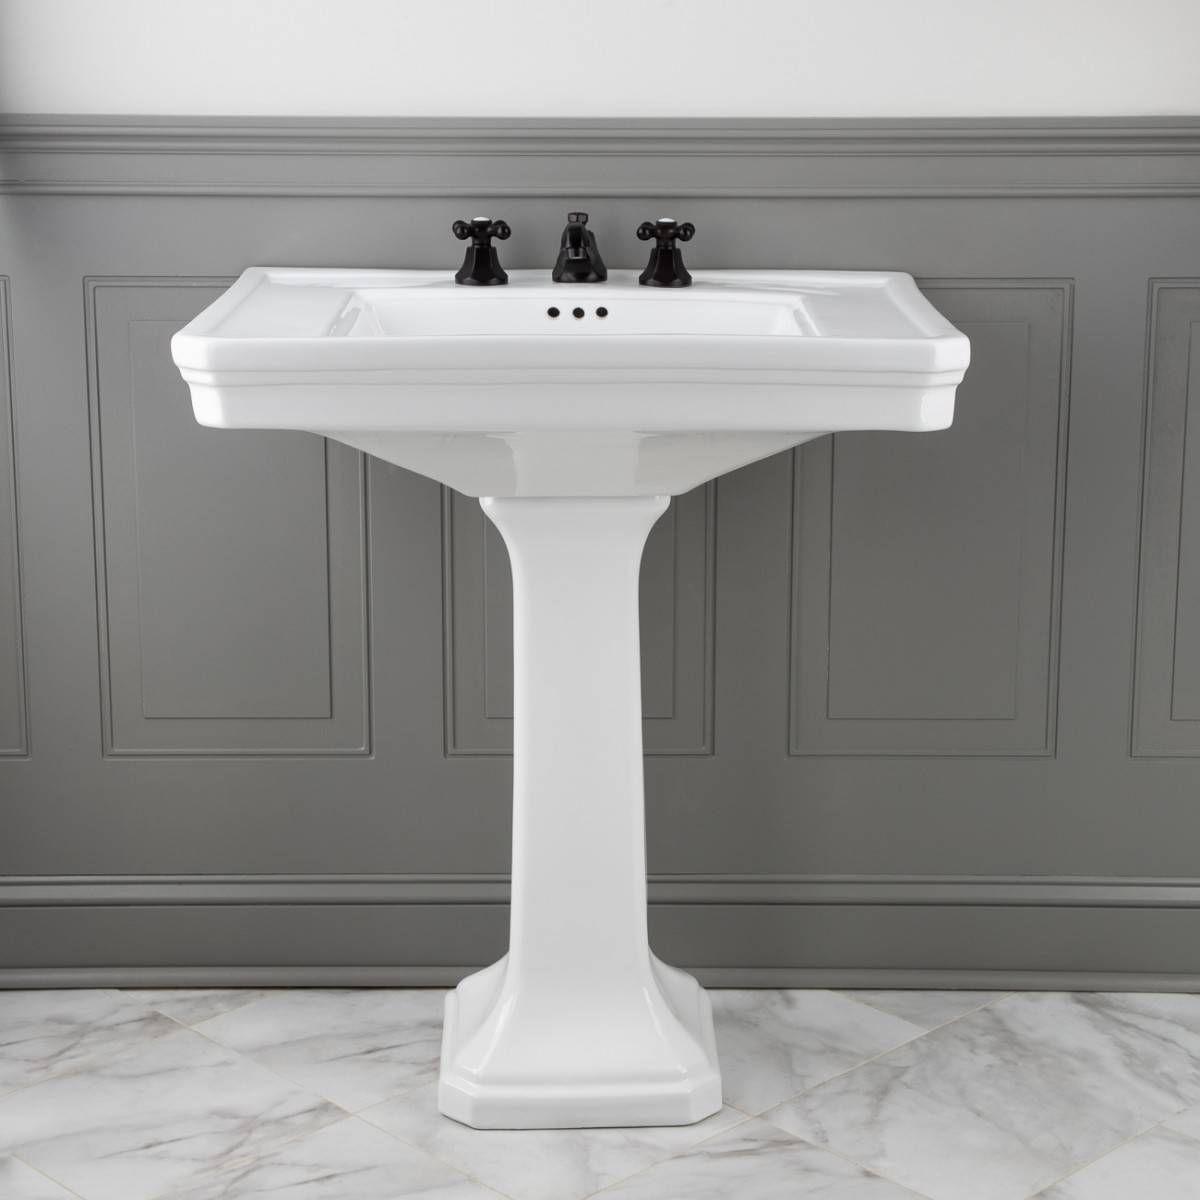 Randolph Morris 30 Inch Pedestal Sink 8 Inch Faucet Drillings